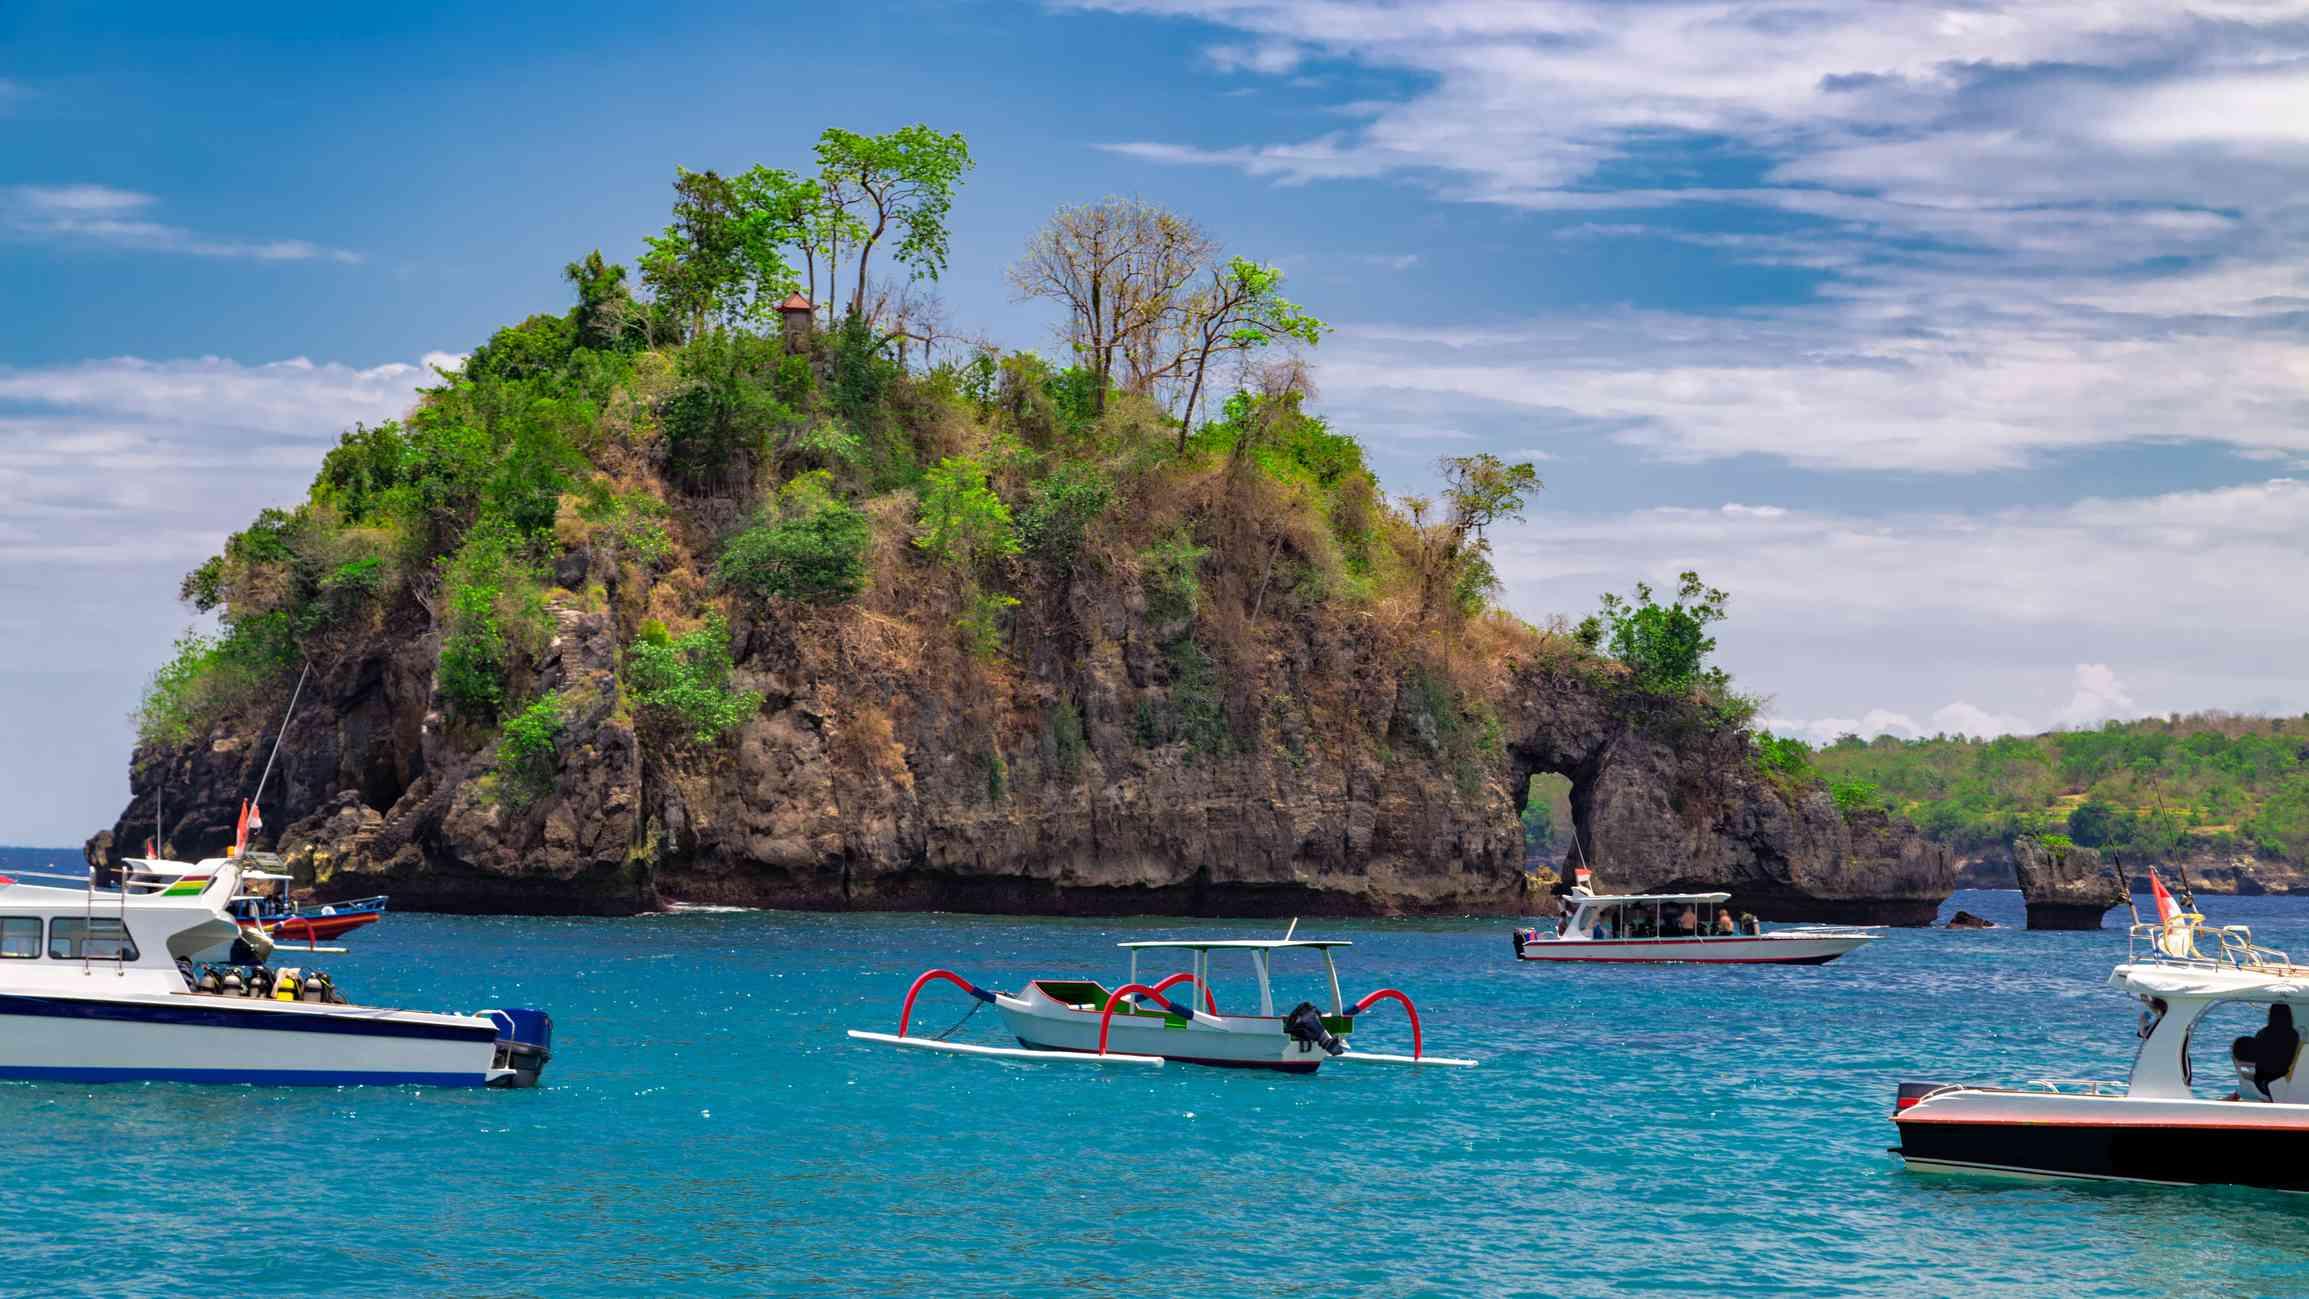 Crystal Bay beach at Nusa Penida island. Indonesia